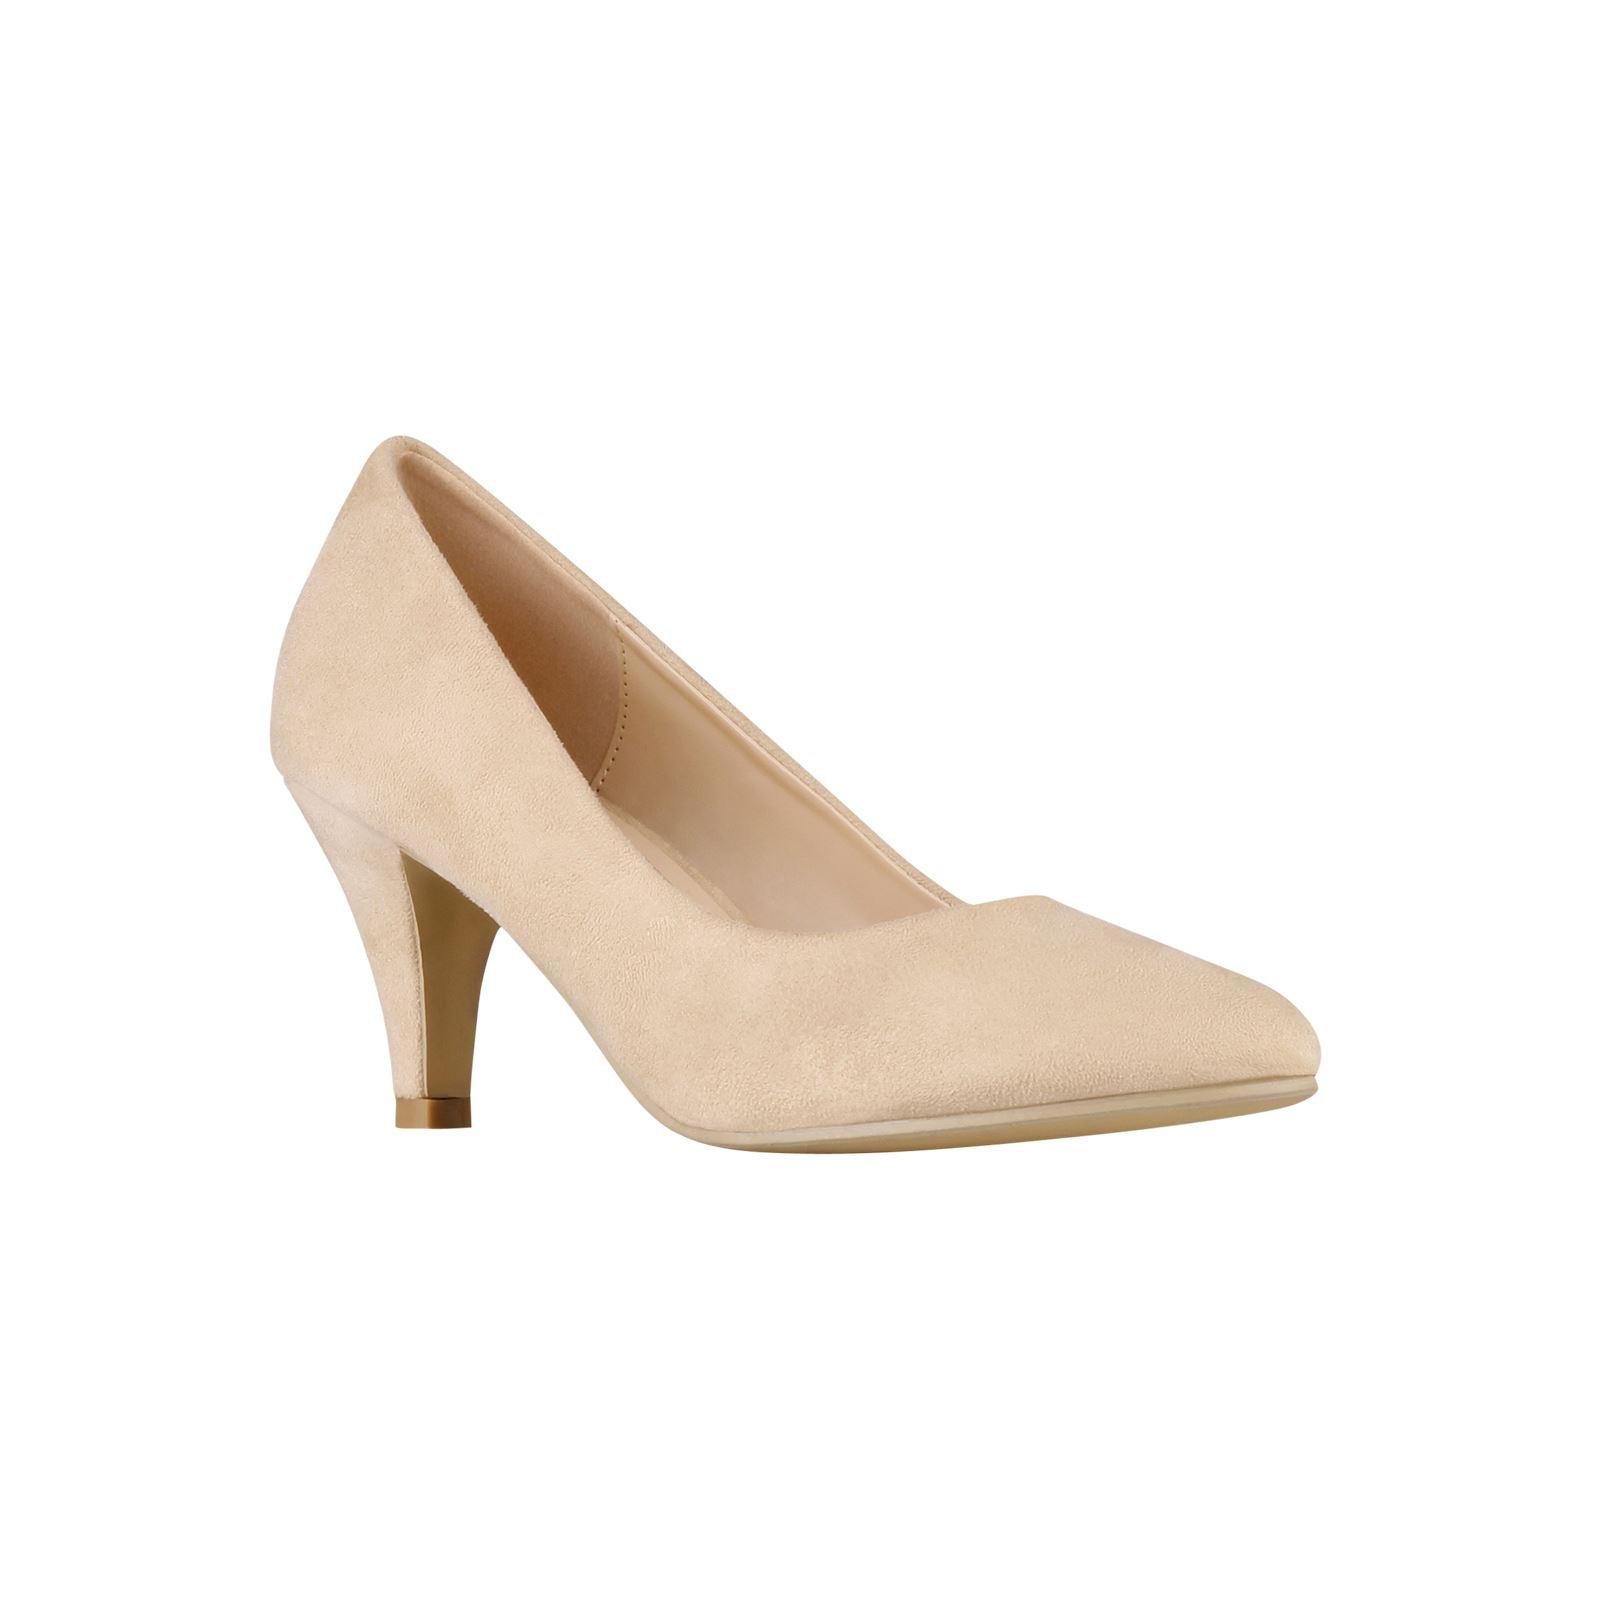 Womens-Ladies-Mid-Heel-Court-Shoes-Slip-On-Low-Kitten-Heels-Pumps-Matte-Size-3-8 thumbnail 3